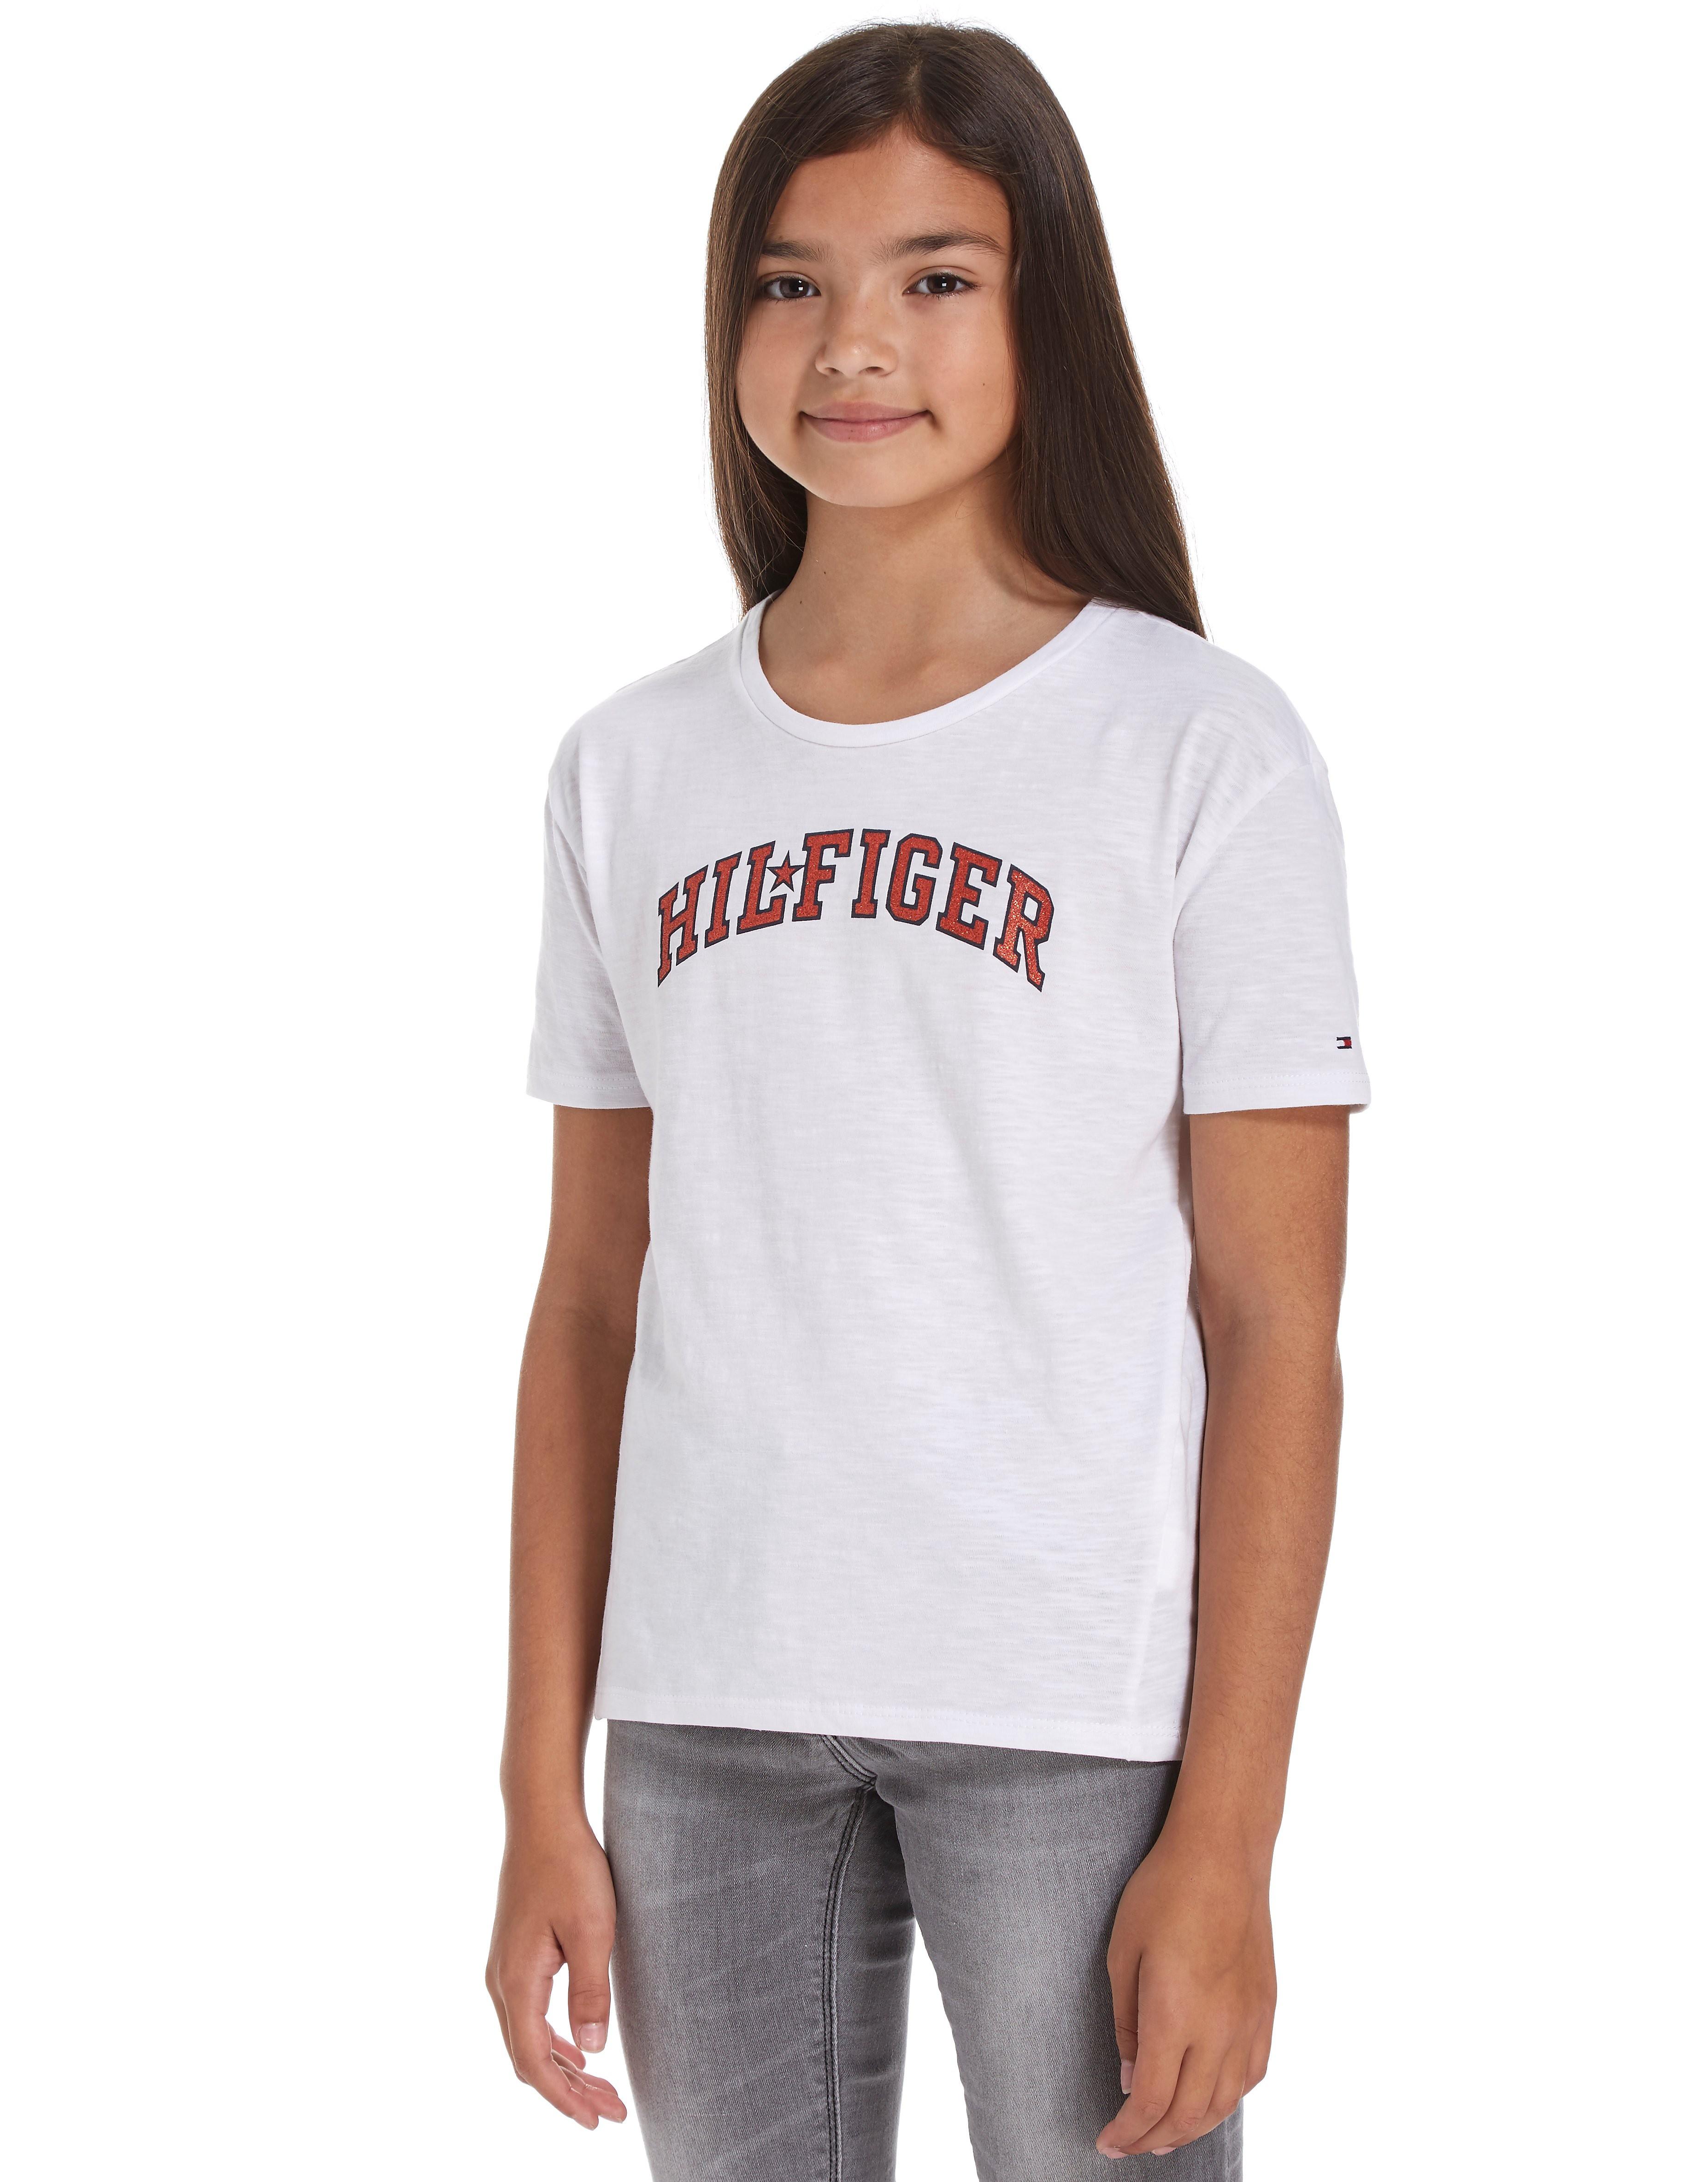 Tommy Hilfiger Girls' Hilfiger T-Shirt Junior